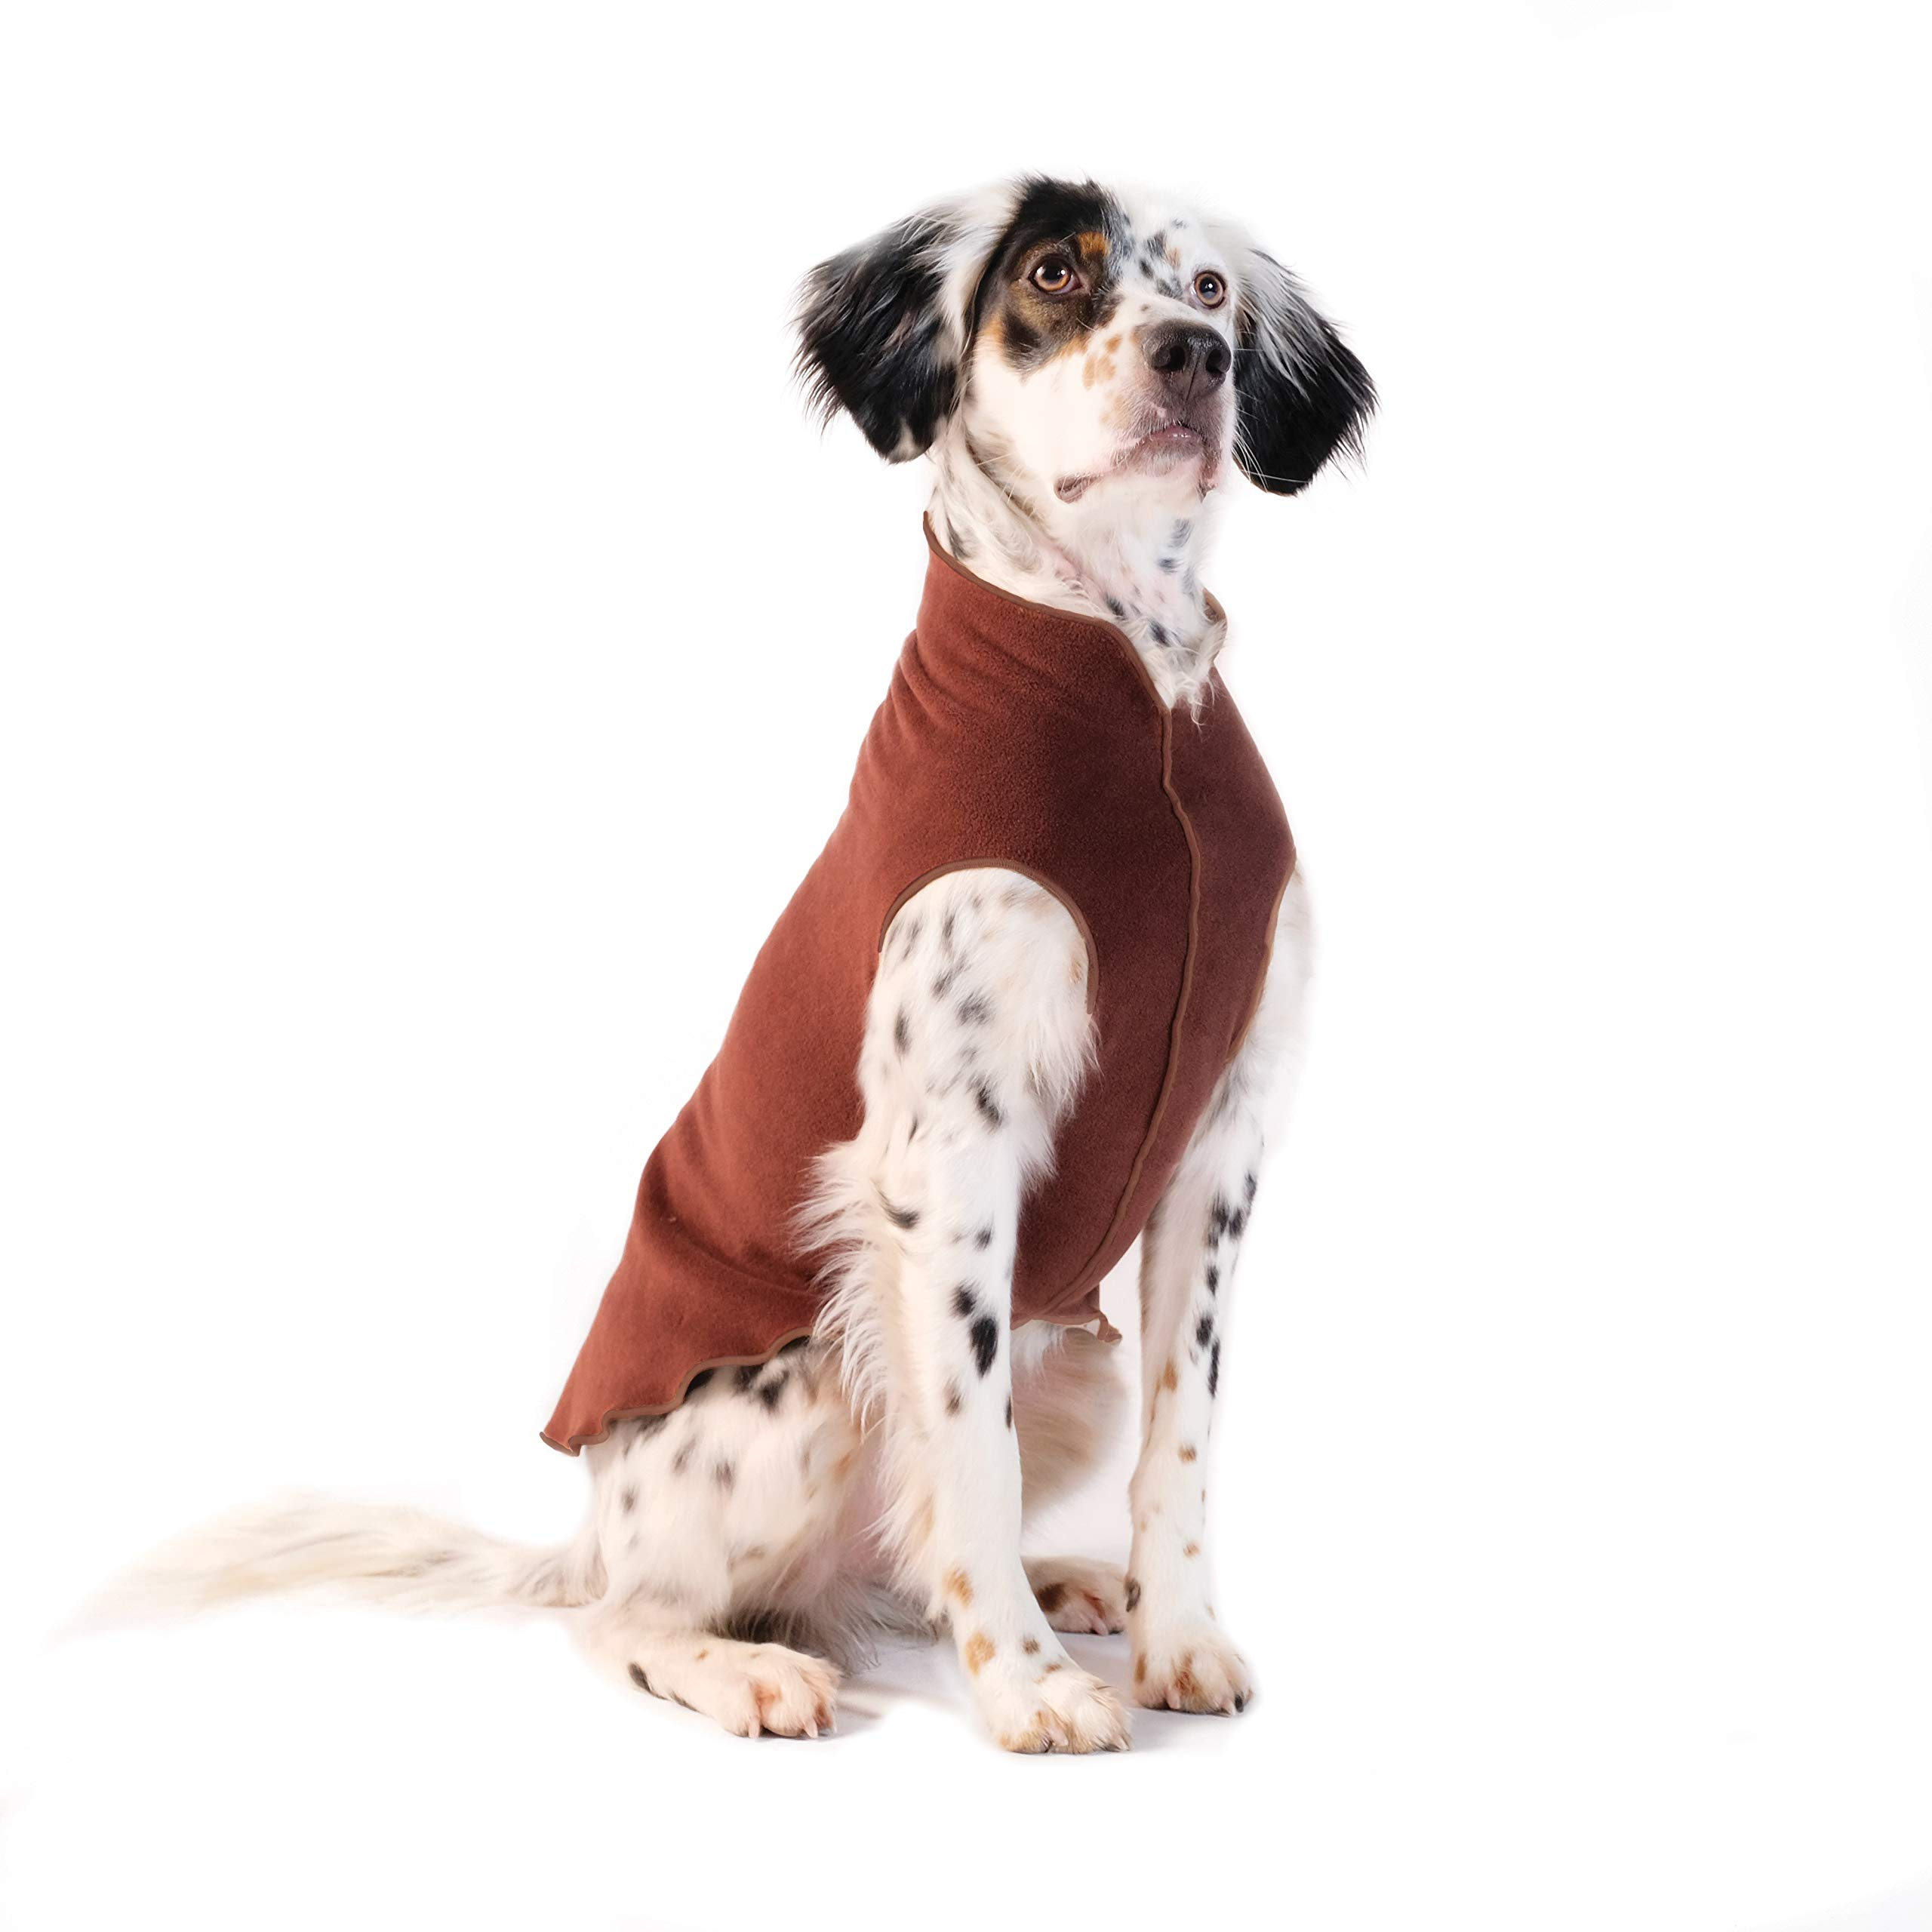 Gold Paw Stretch Fleece Dog Coat - Soft, Warm Dog Clothes, Stretchy Pet Sweater - Machine Washable, Eco Friendly - All Season - Sizes 2-33, Chestnut, Size 14